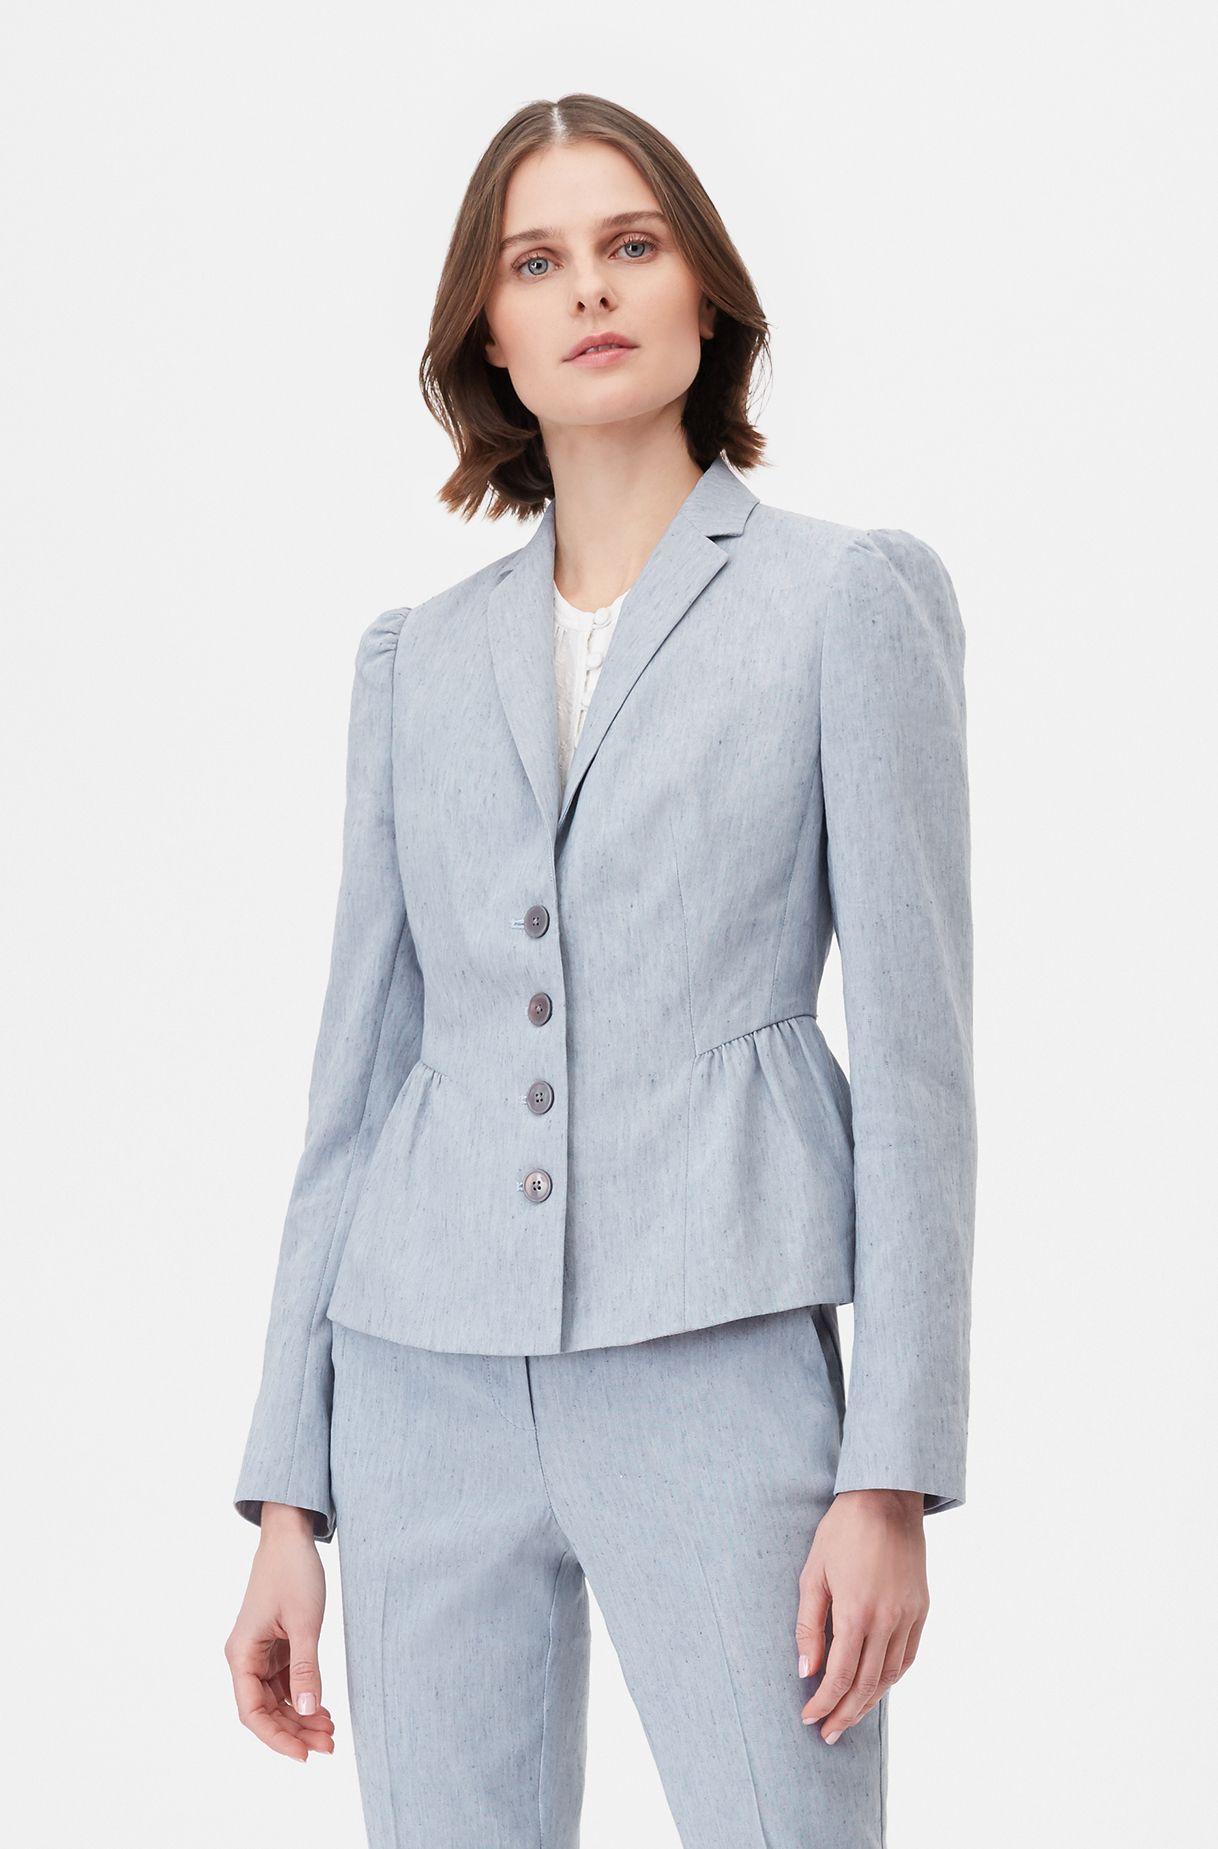 Tailored Stretch Linen Blend Jacket Rebecca Taylor Women Outerwear Jacket Jackets Rebecca Taylor [ 1849 x 1218 Pixel ]